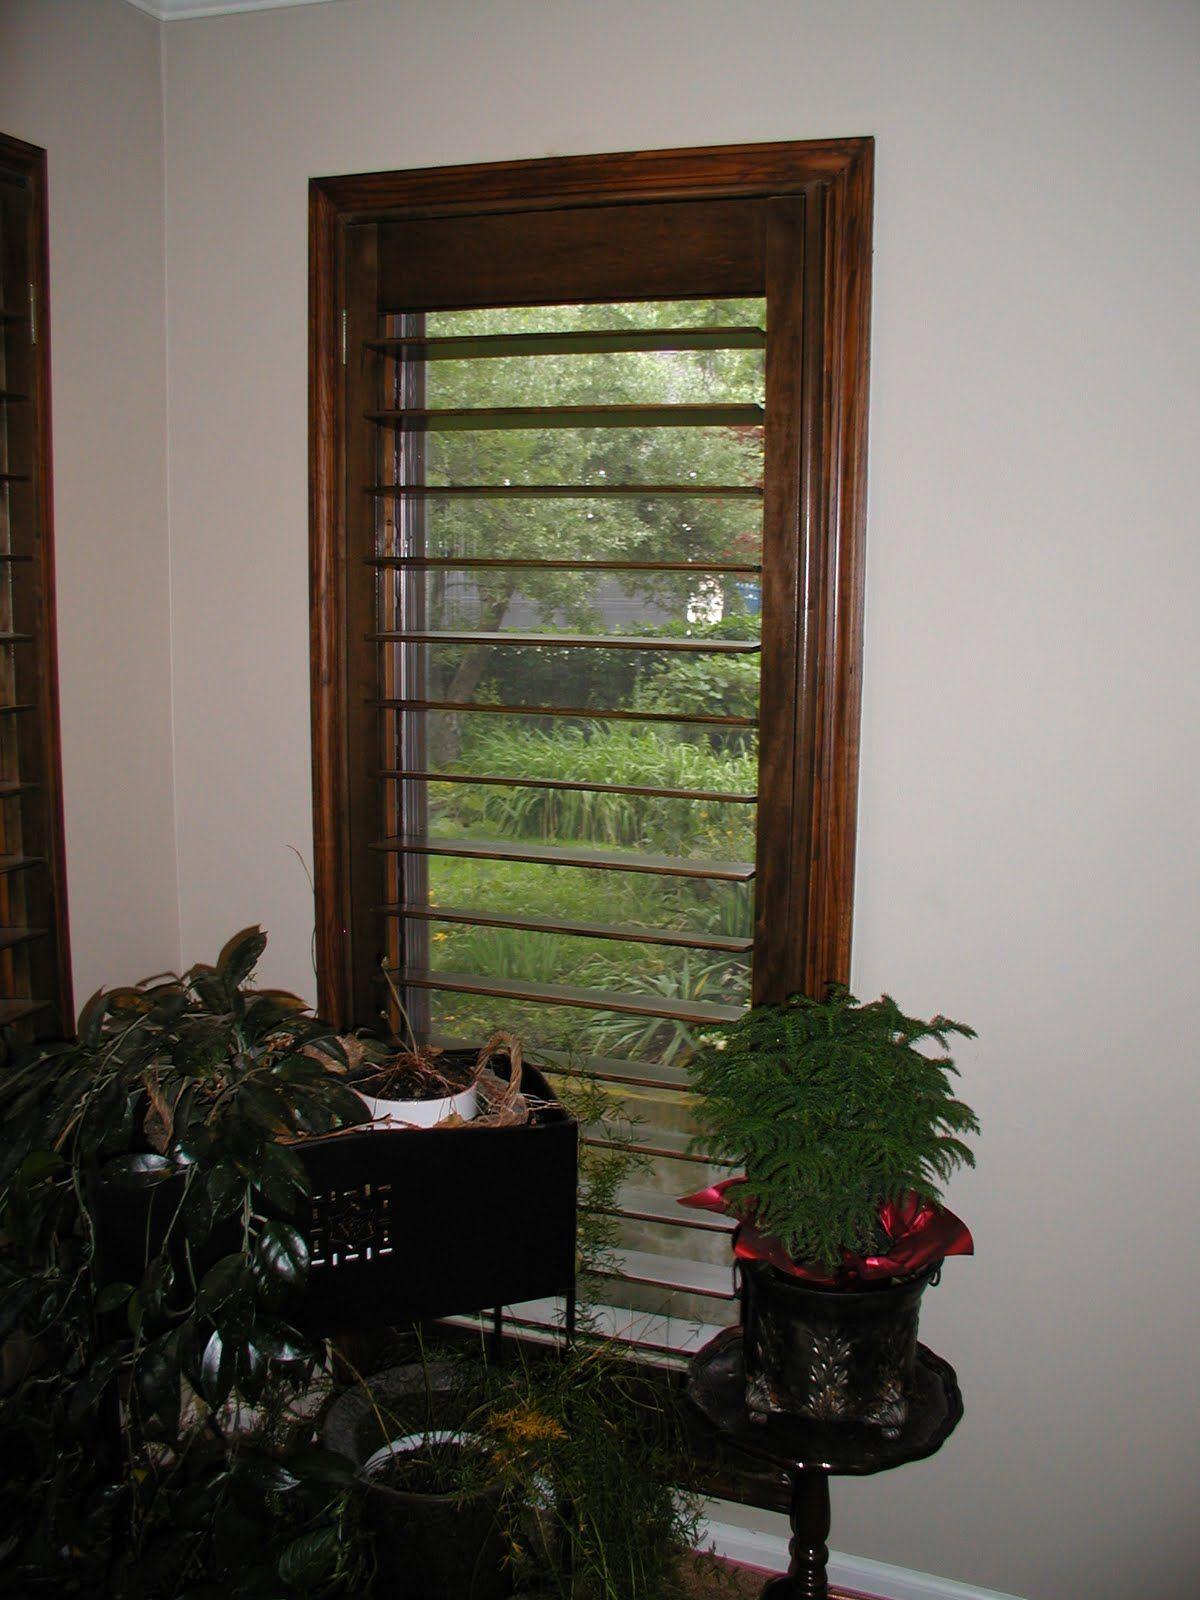 Gallery ladder decor shutters decor